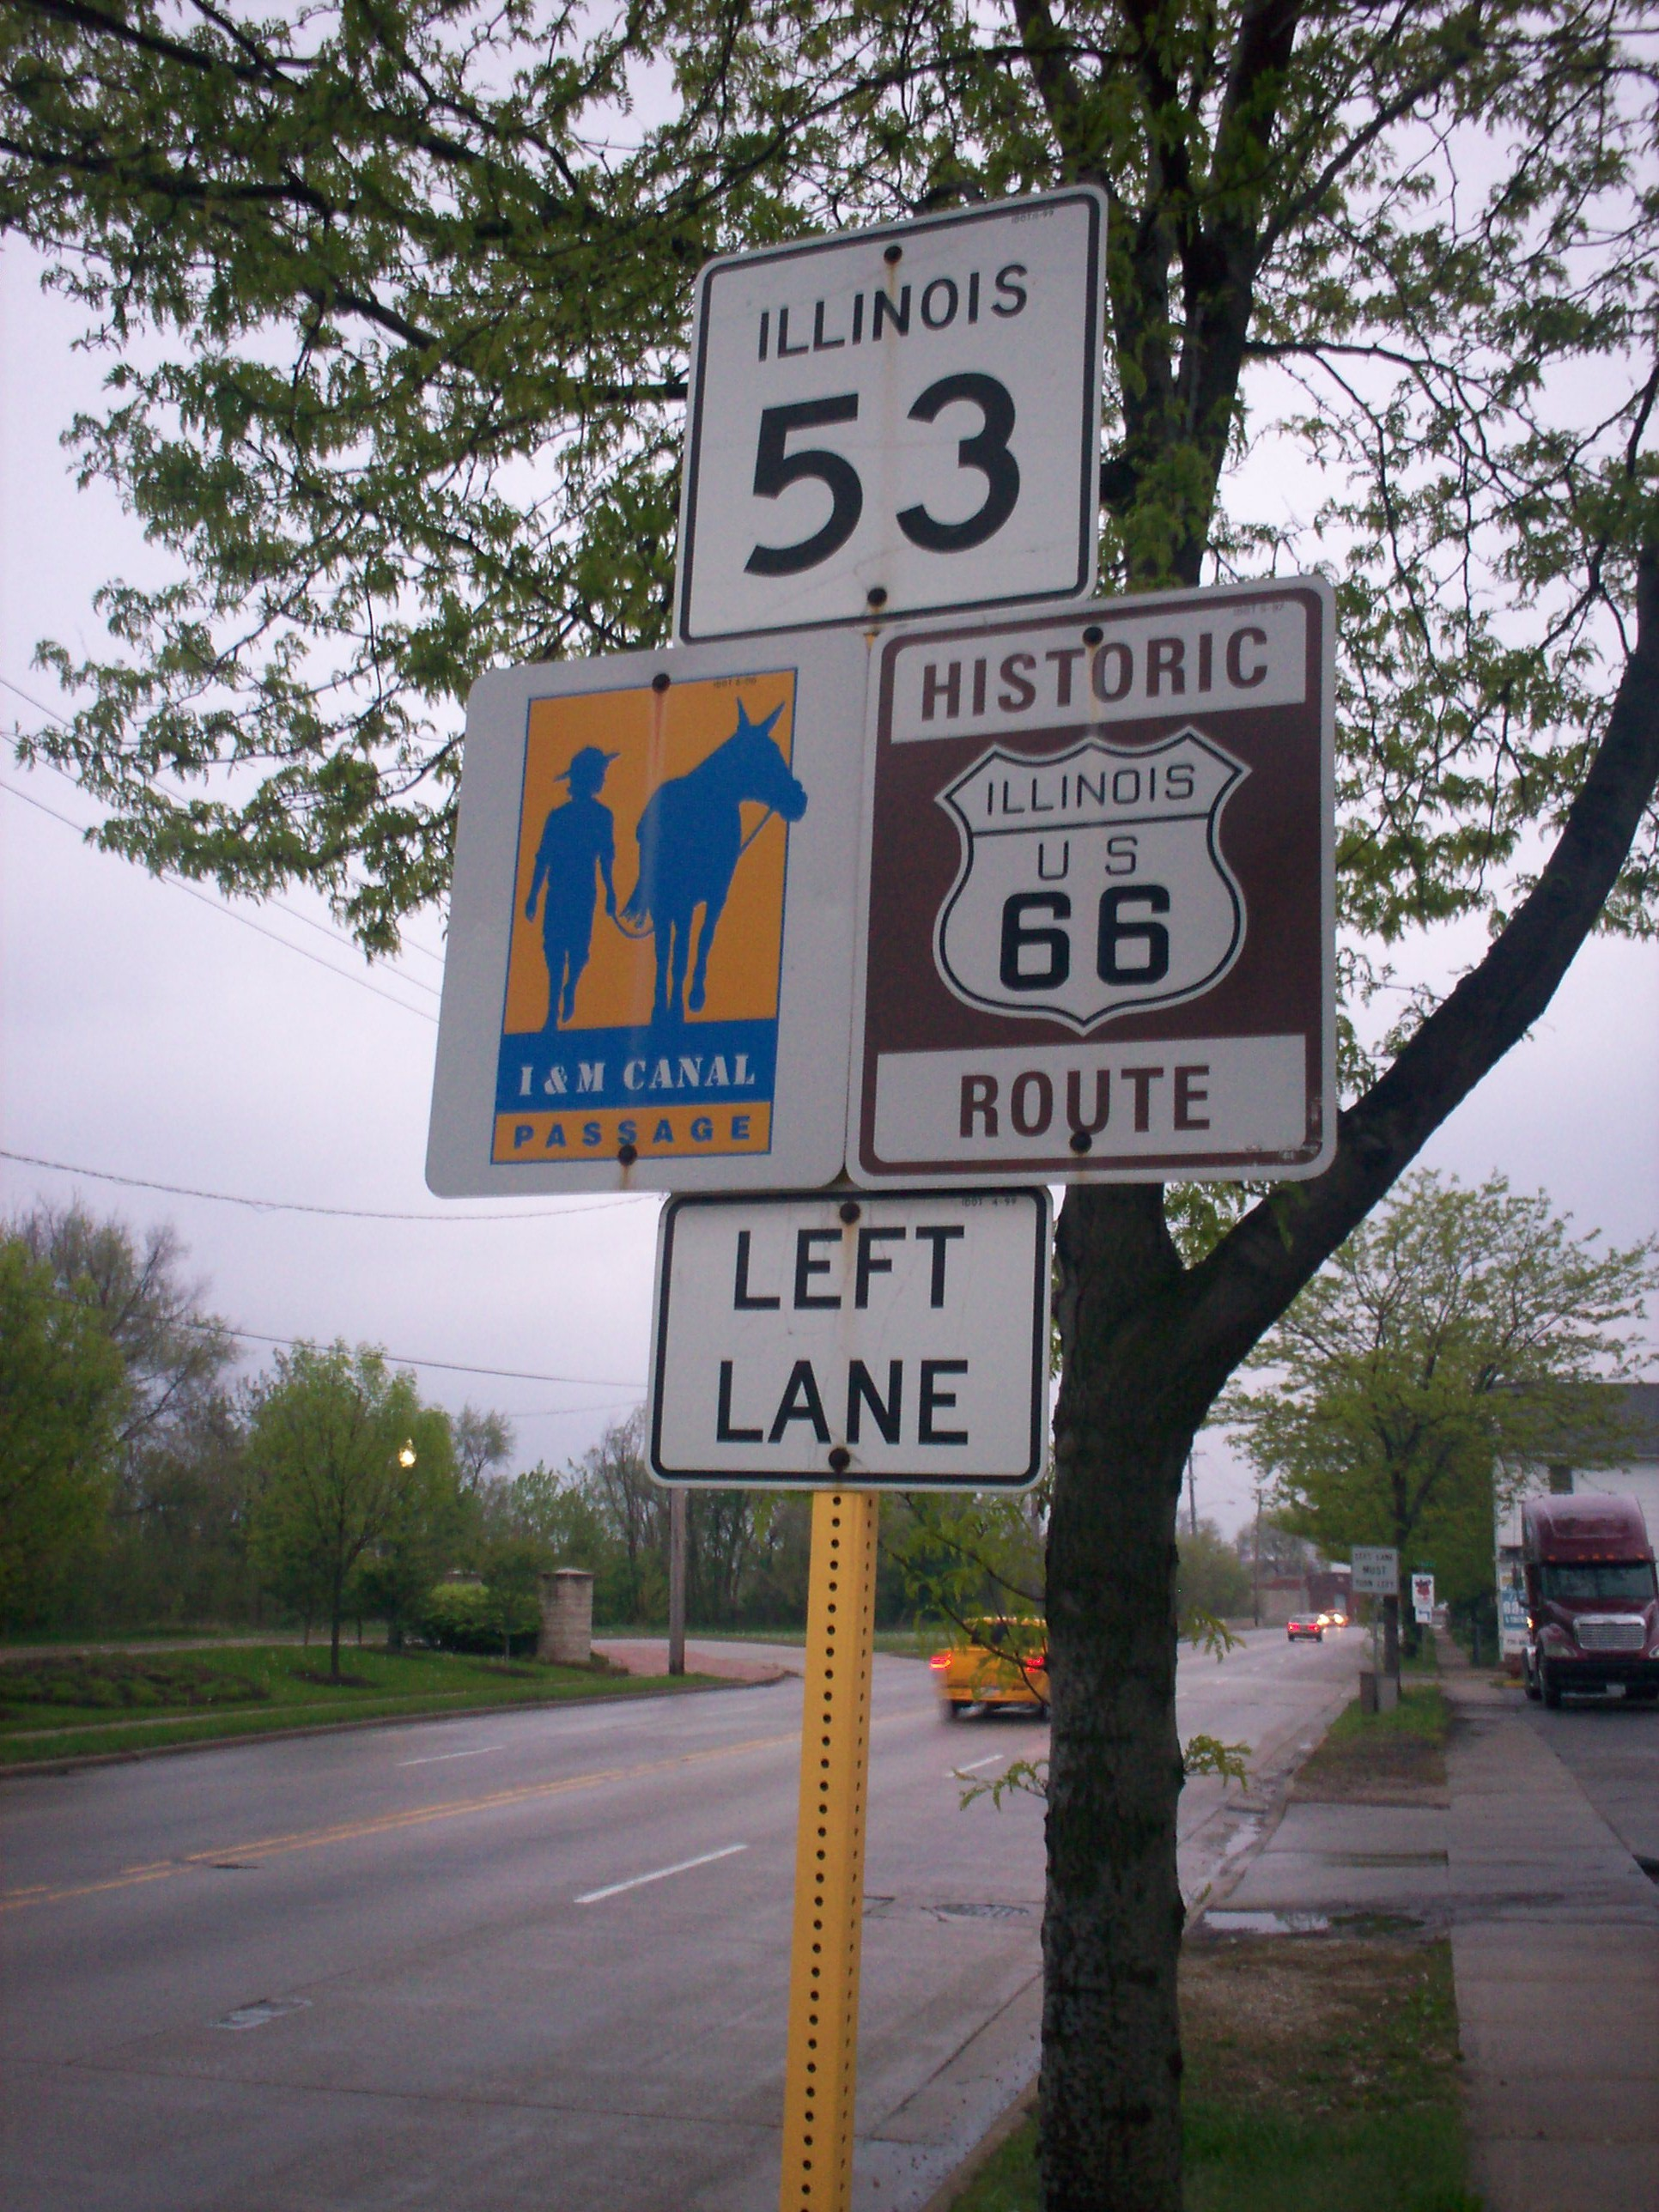 Joliet Illinois Familypedia FANDOM Powered By Wikia - Map us highway route 66